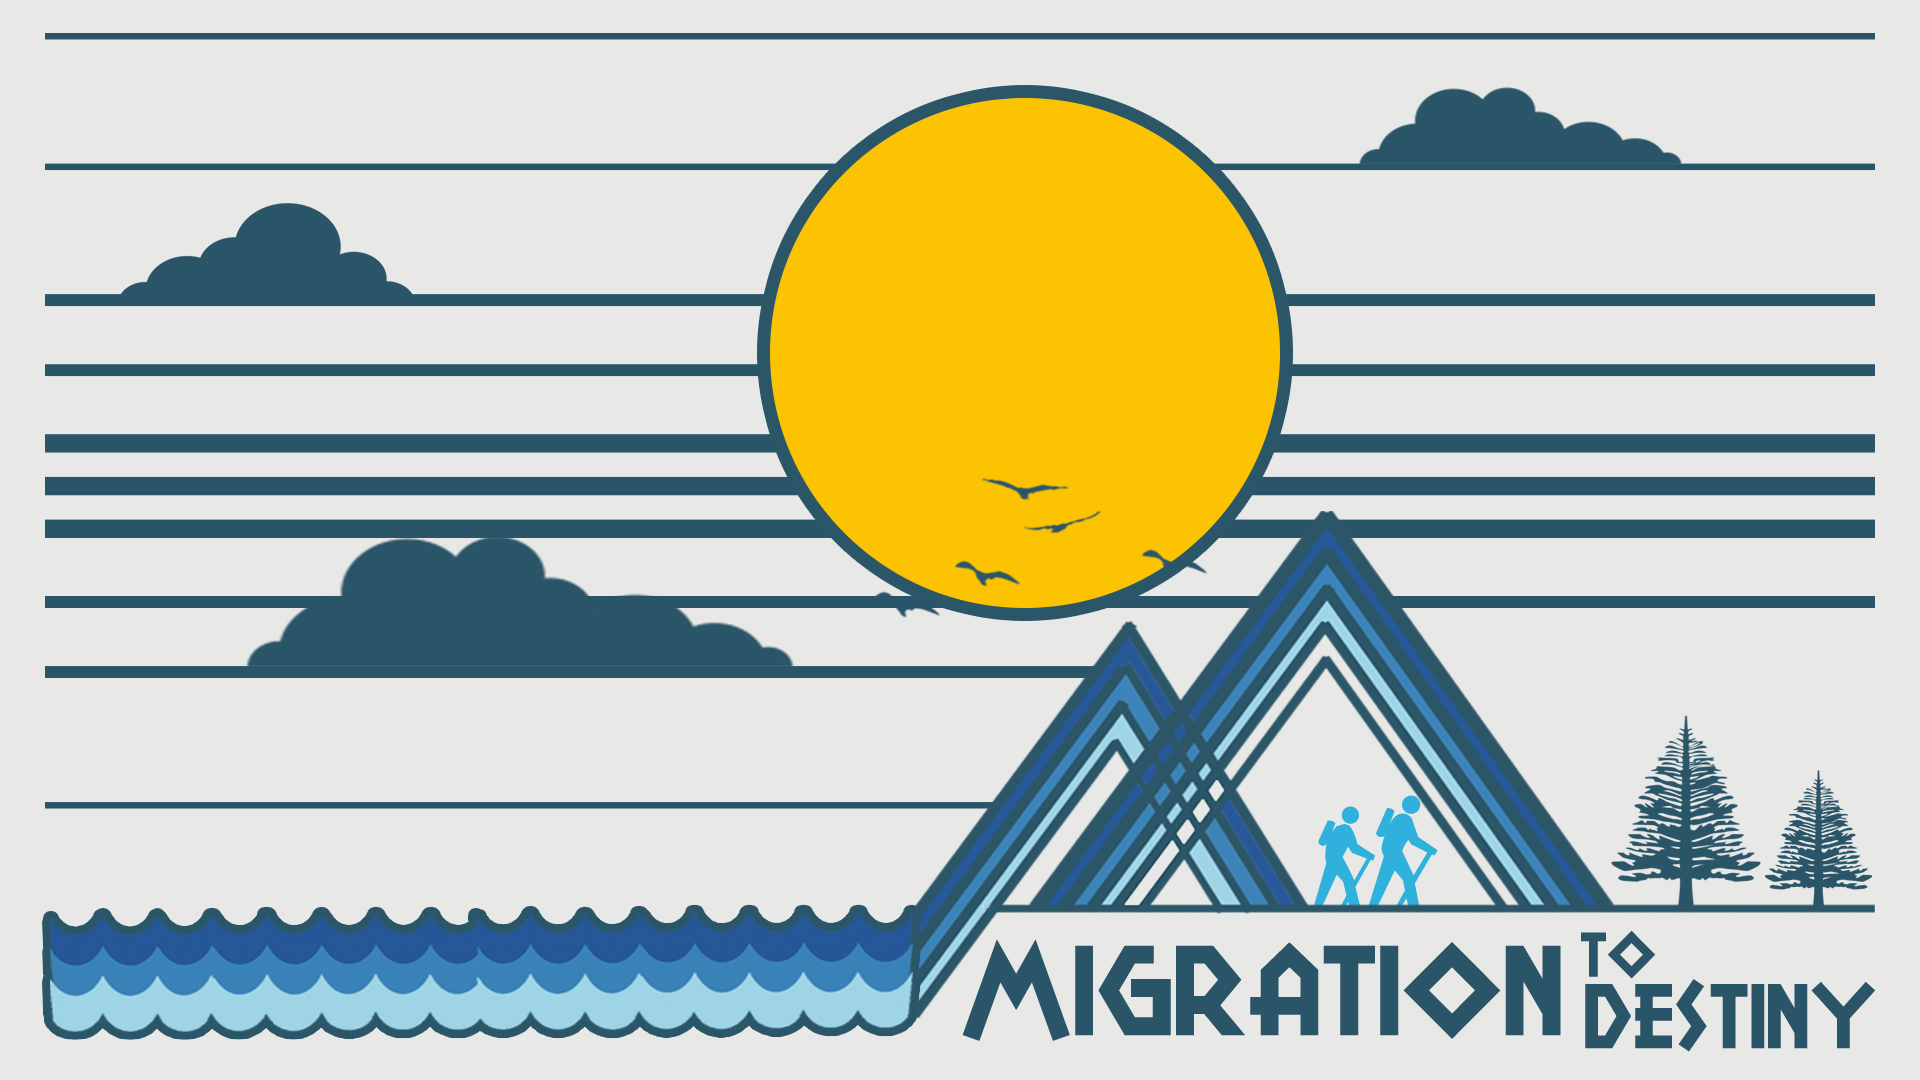 Migration-To-Destiny-Main.jpg